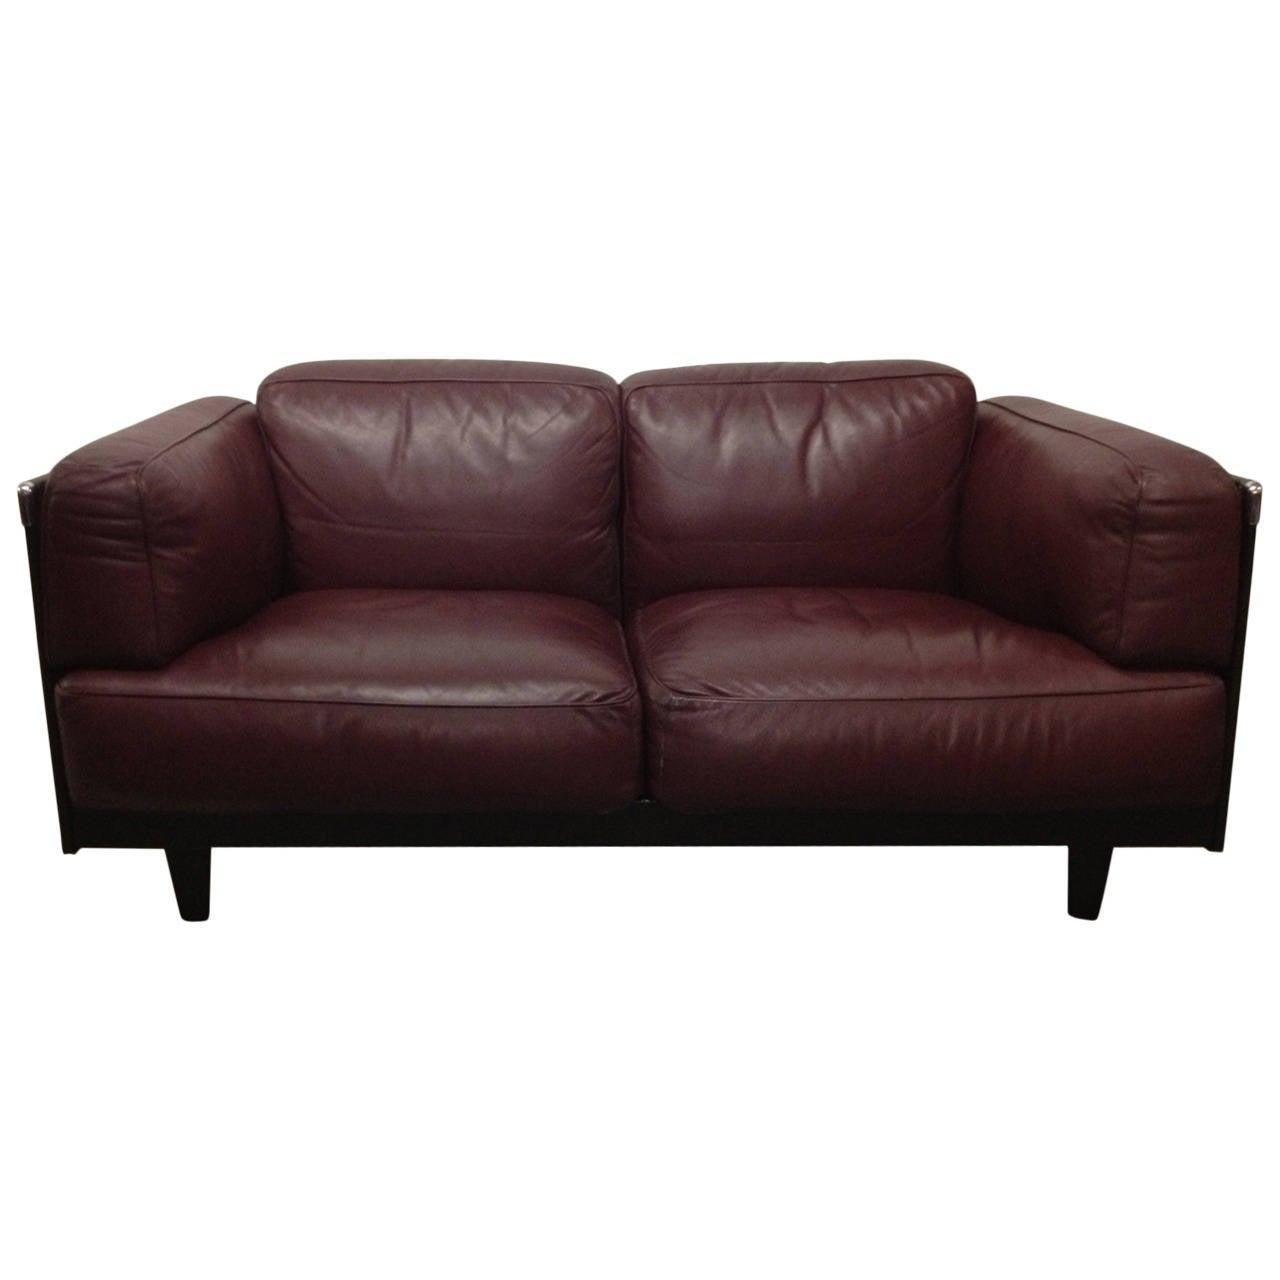 Leather sofa by poltrona frau 1